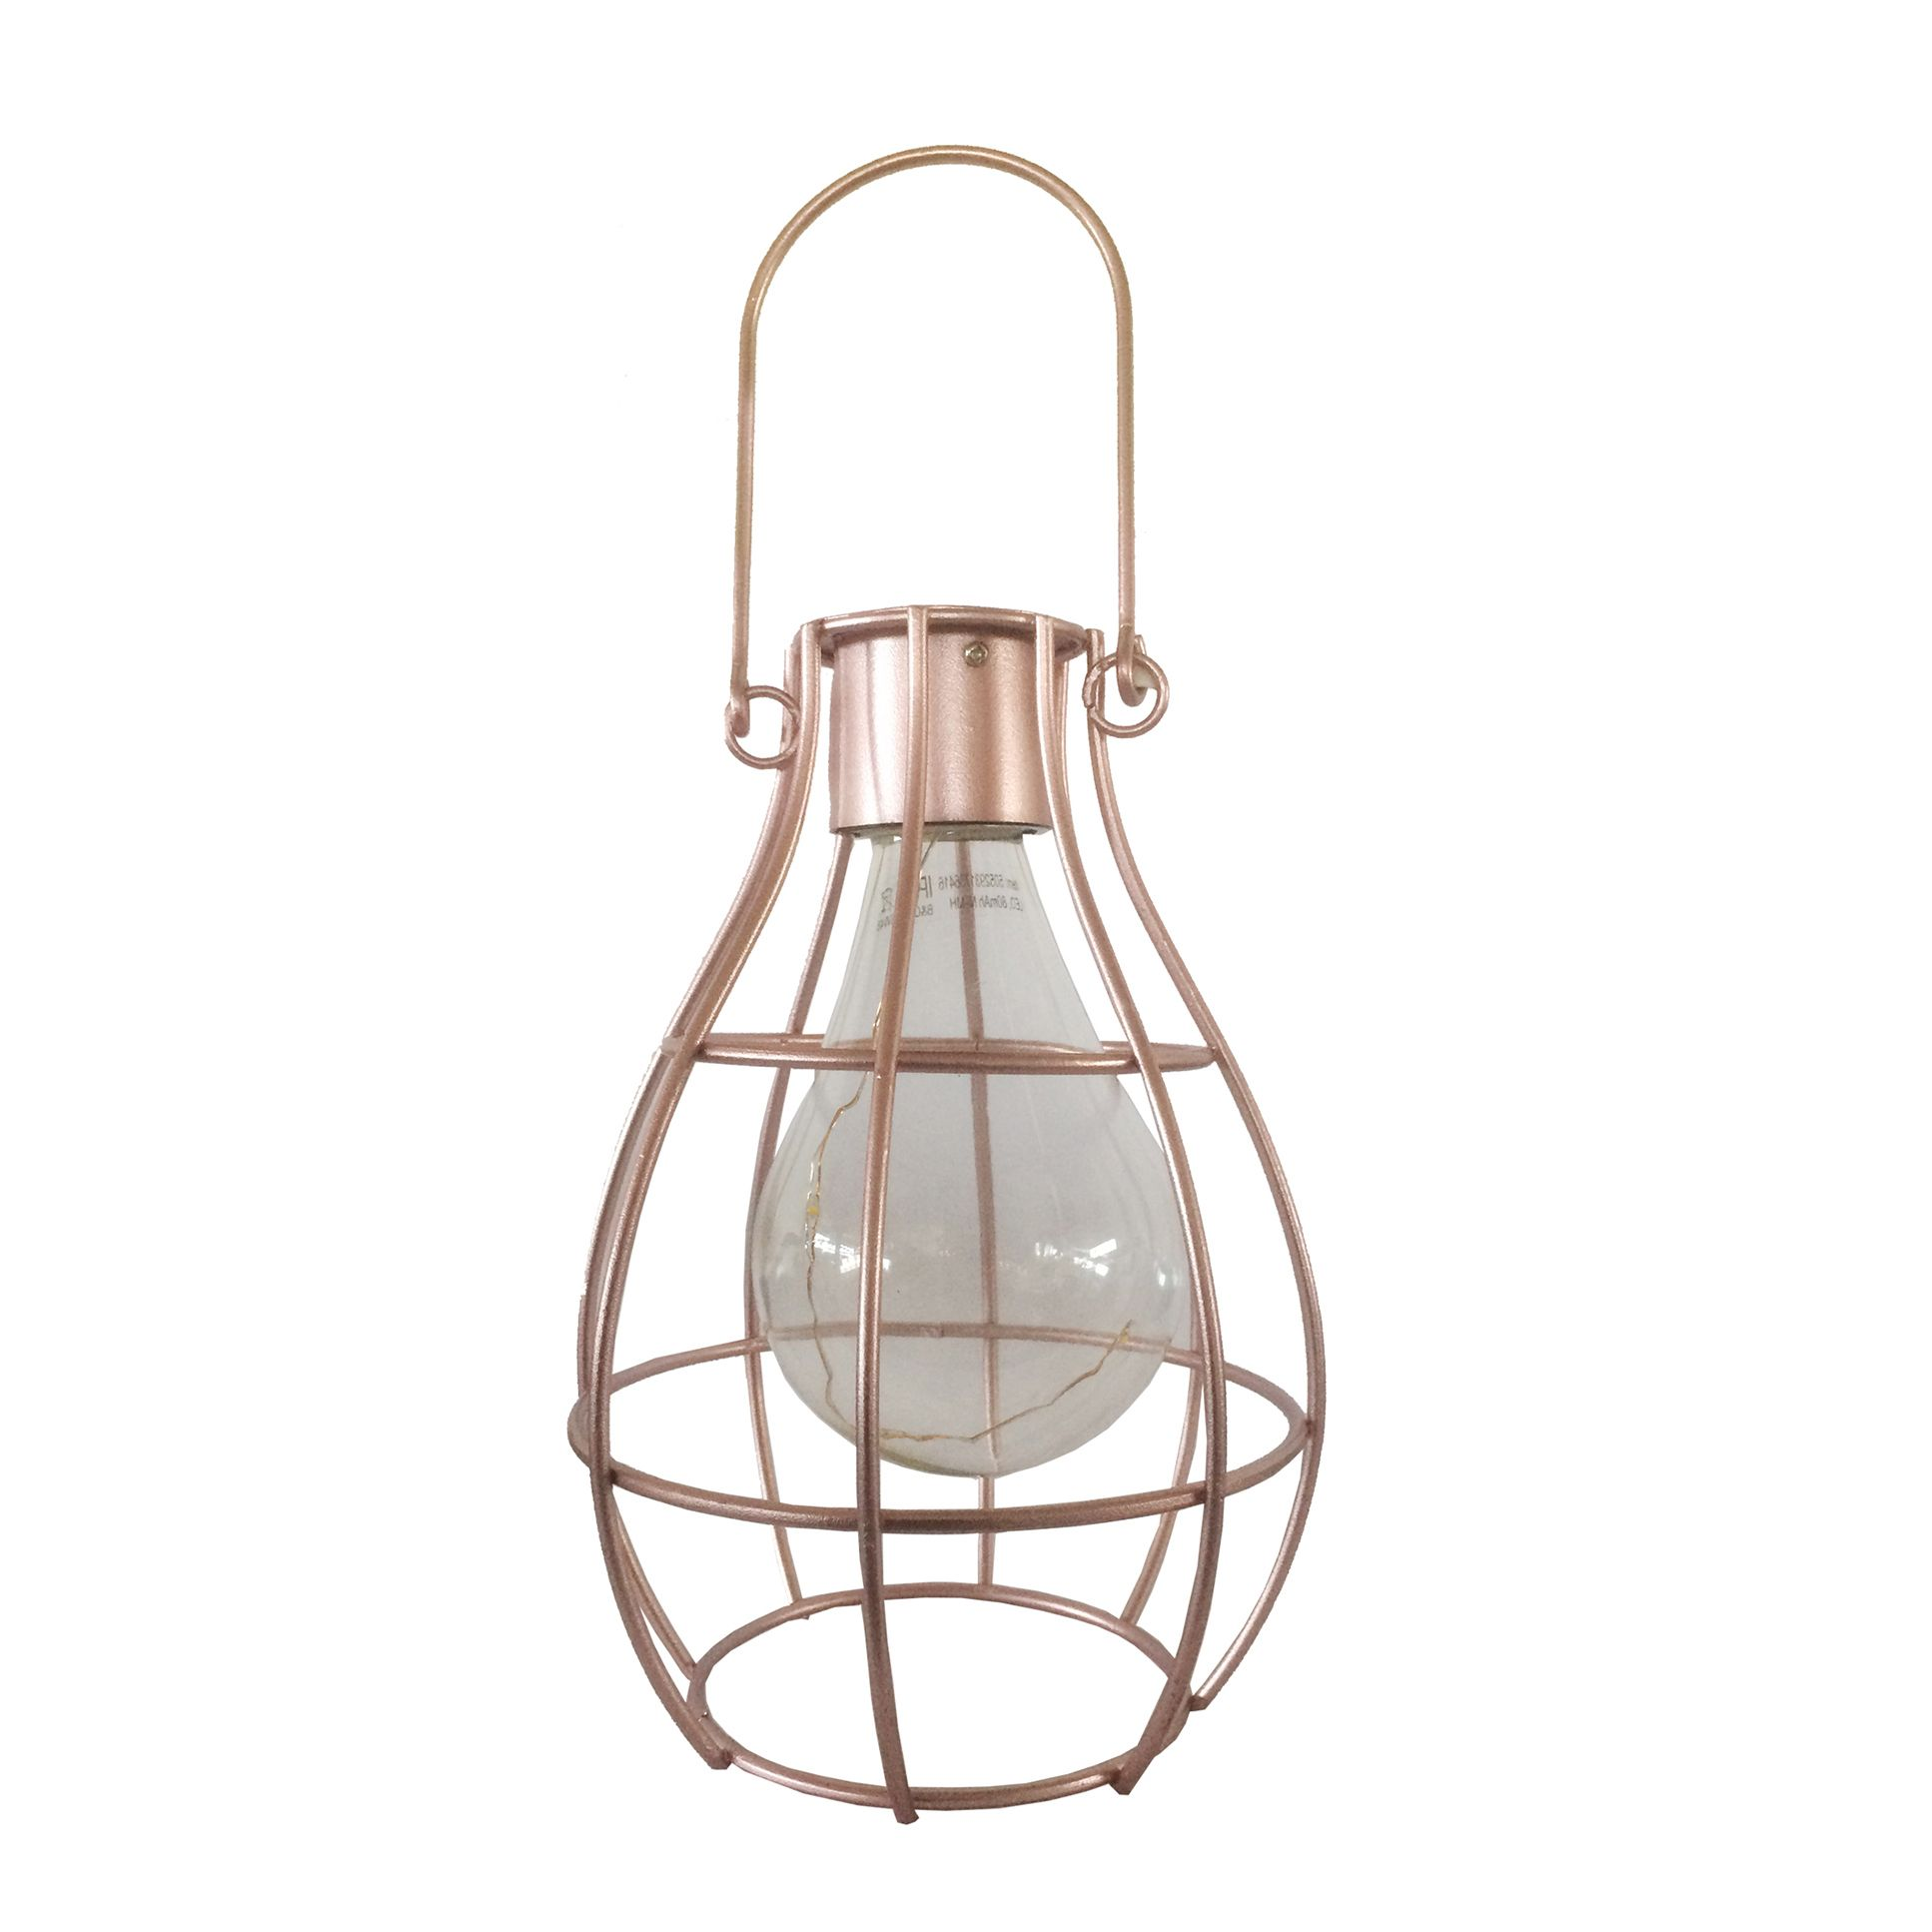 Blooma Ellopos Caged Solar Powered Led Hanging Lantern